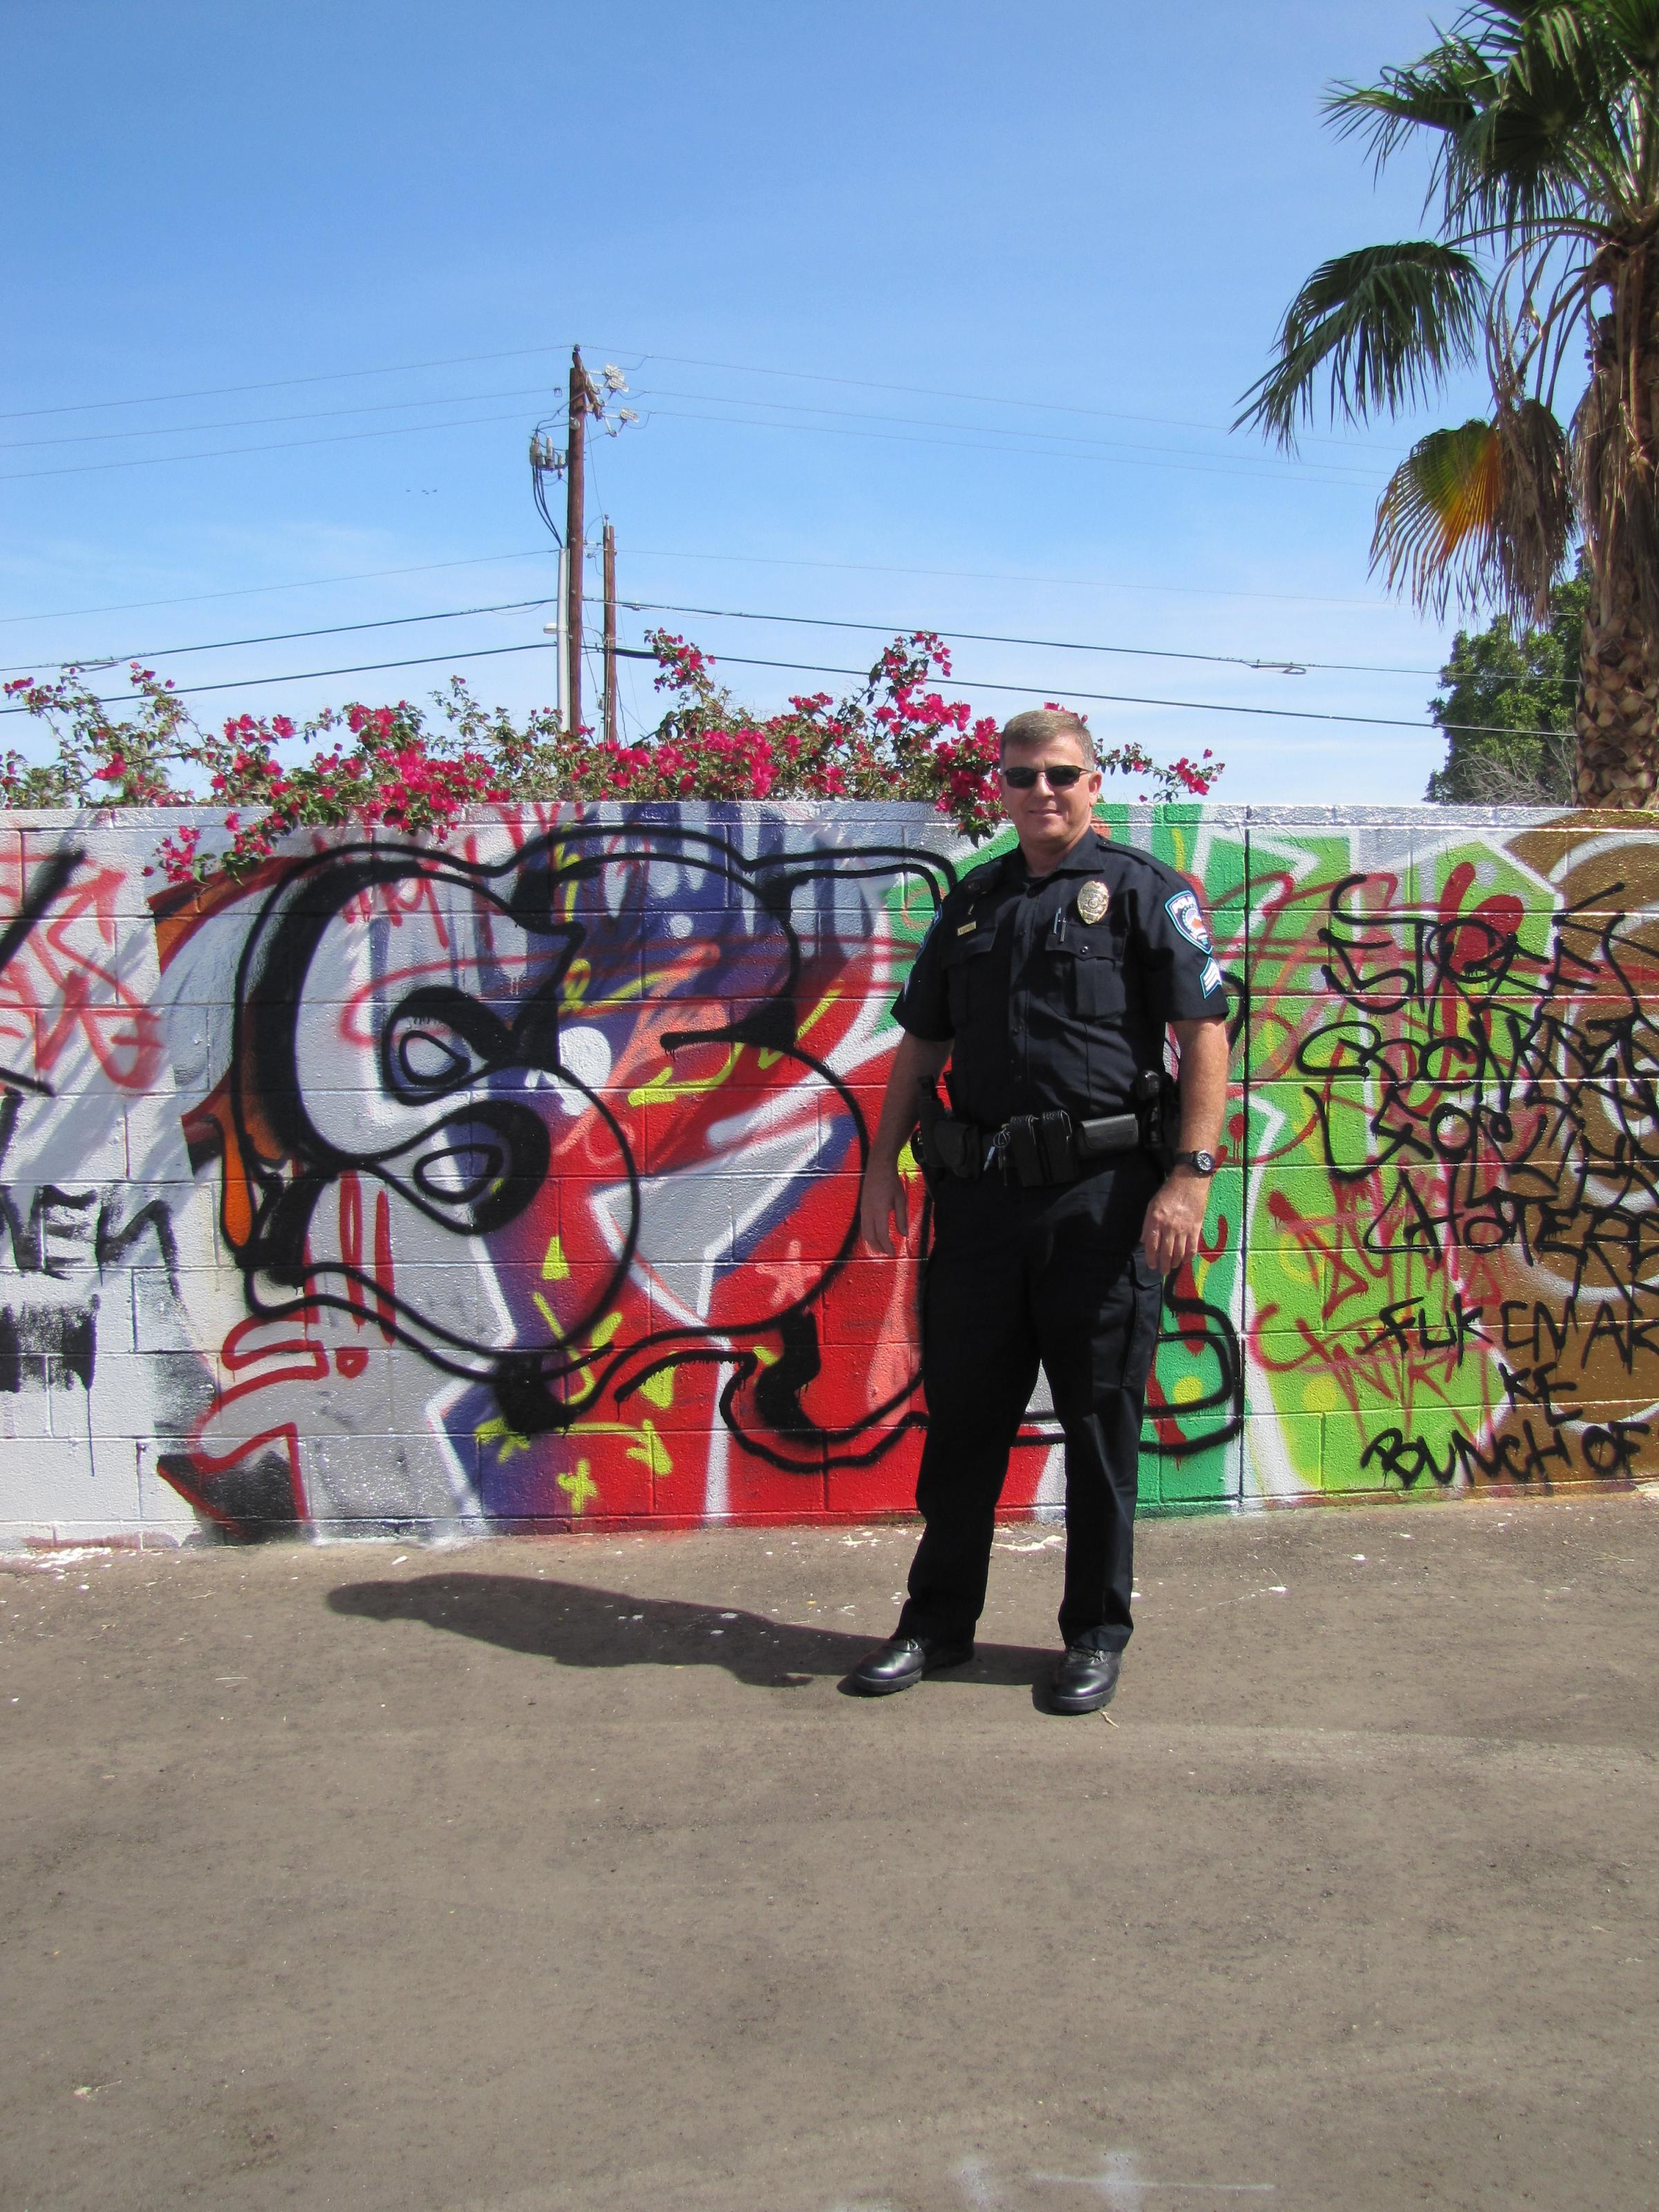 Graffiti wall activity - Sergeant Scott Legros In Front Of The Vertical Church Graffiti Wall